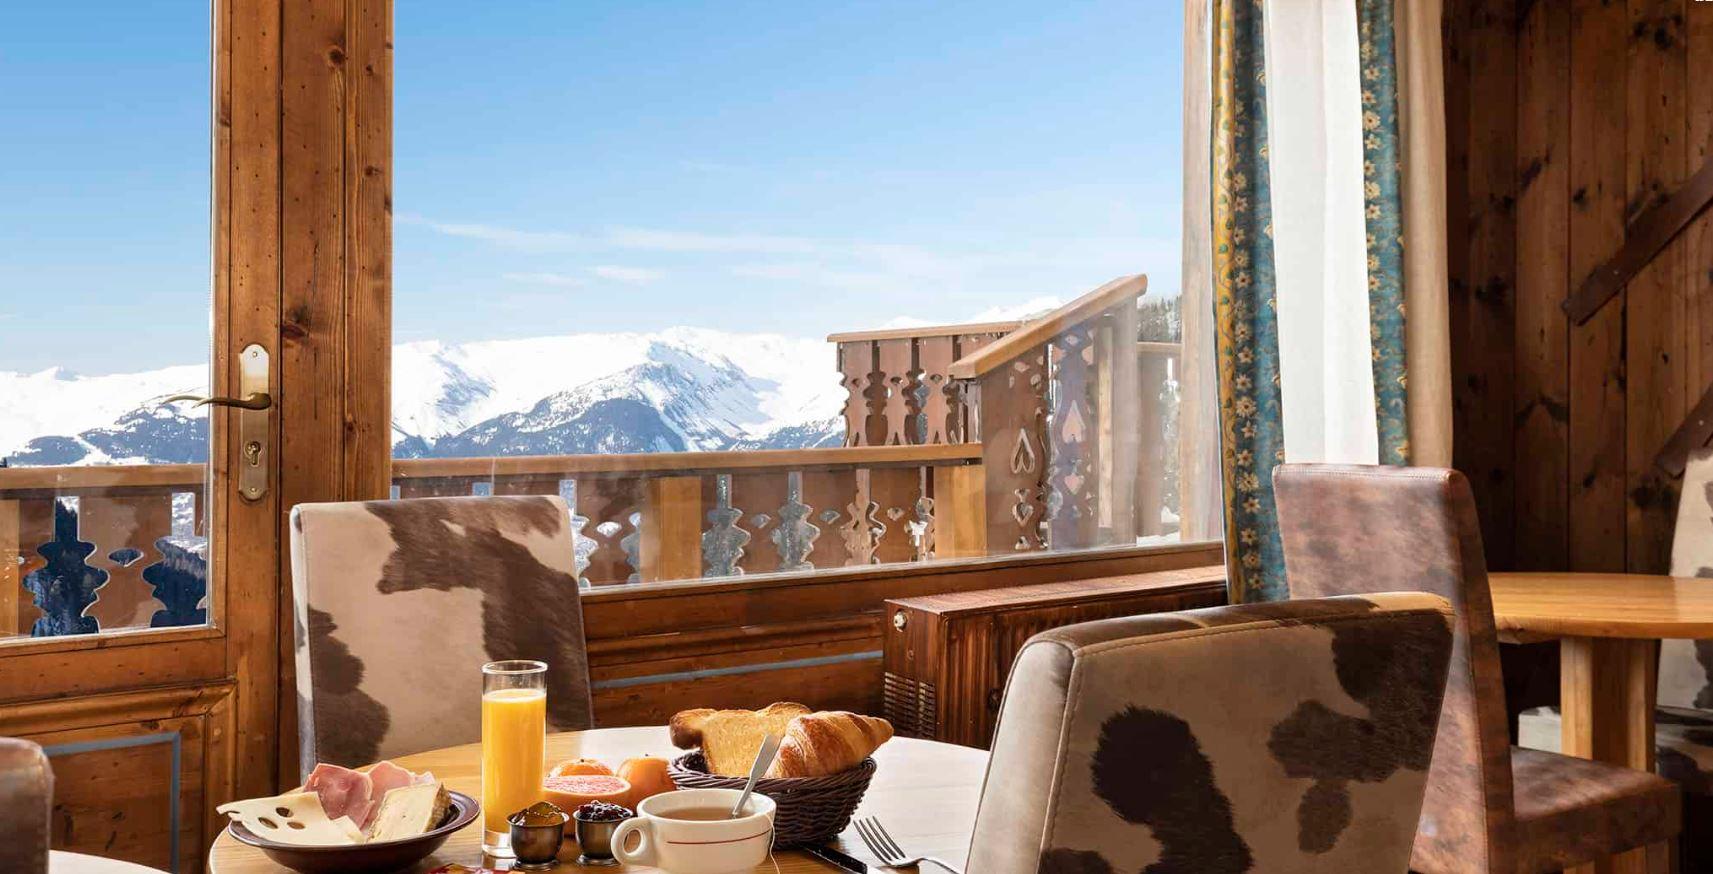 The amazing view out of the restaurant window at Les Balcons de Belle Plagne